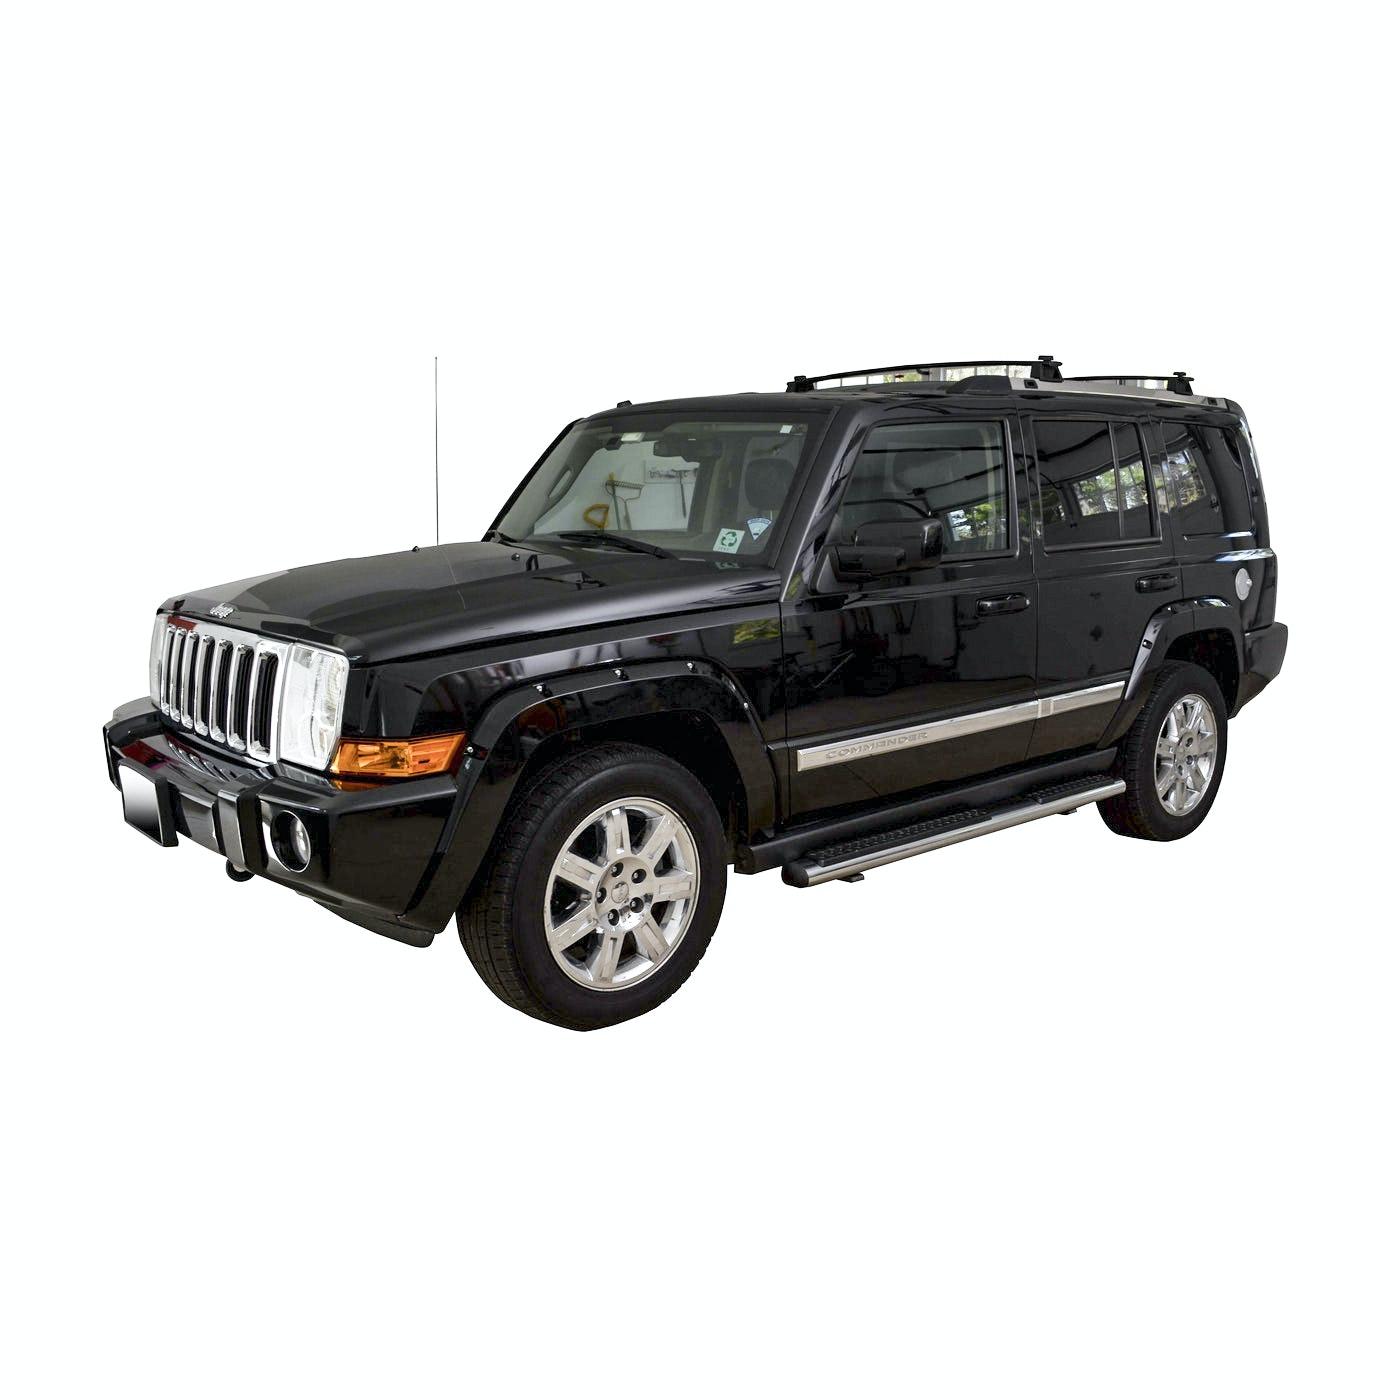 2010 Jeep Commander Hemi Limited 4WD Sport Utility Vehicle